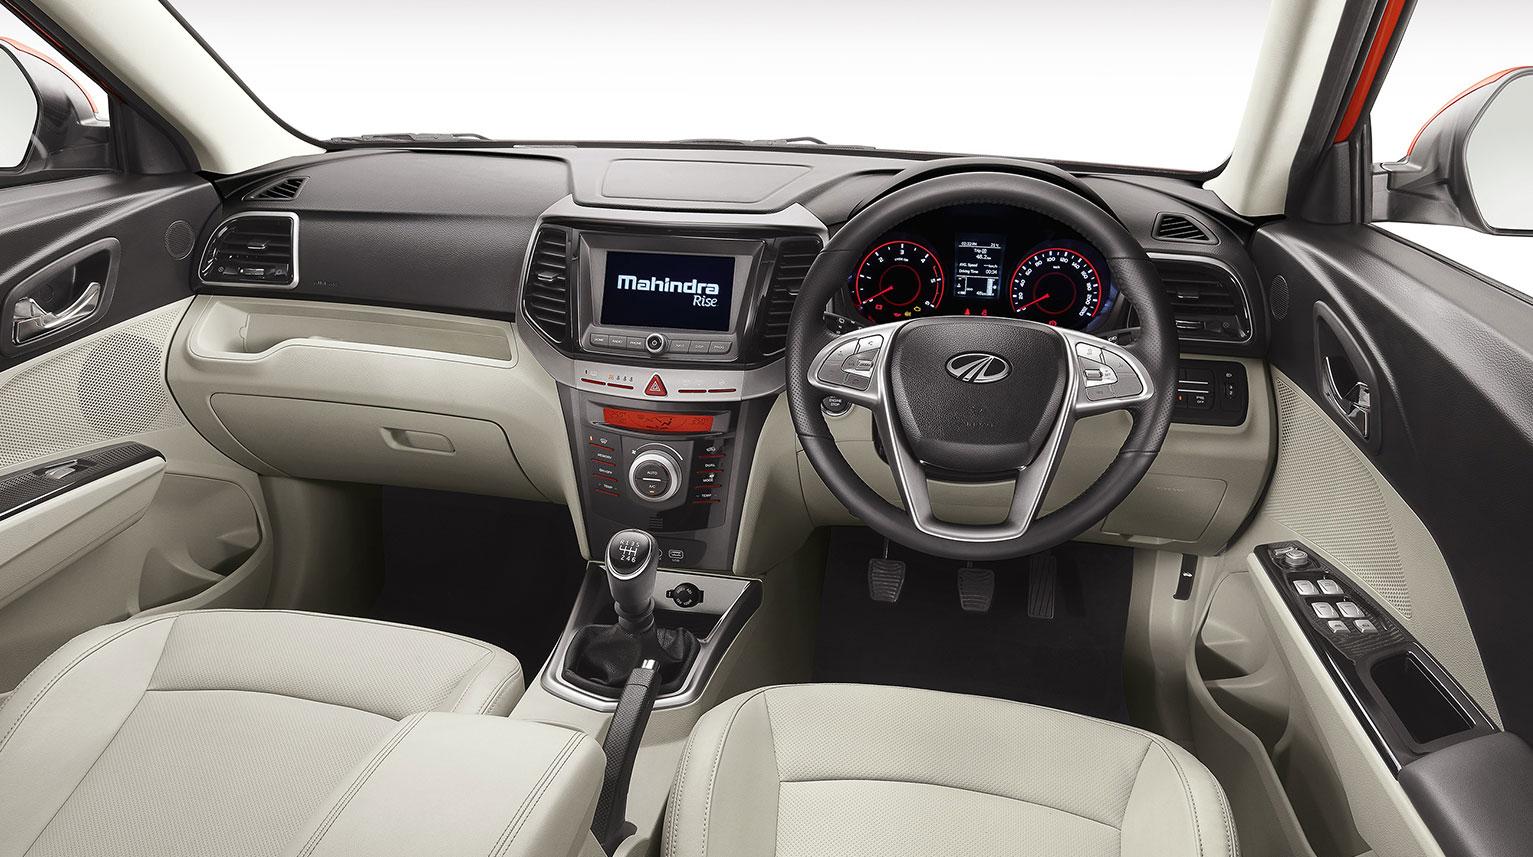 Mahindra XUV300 interiors